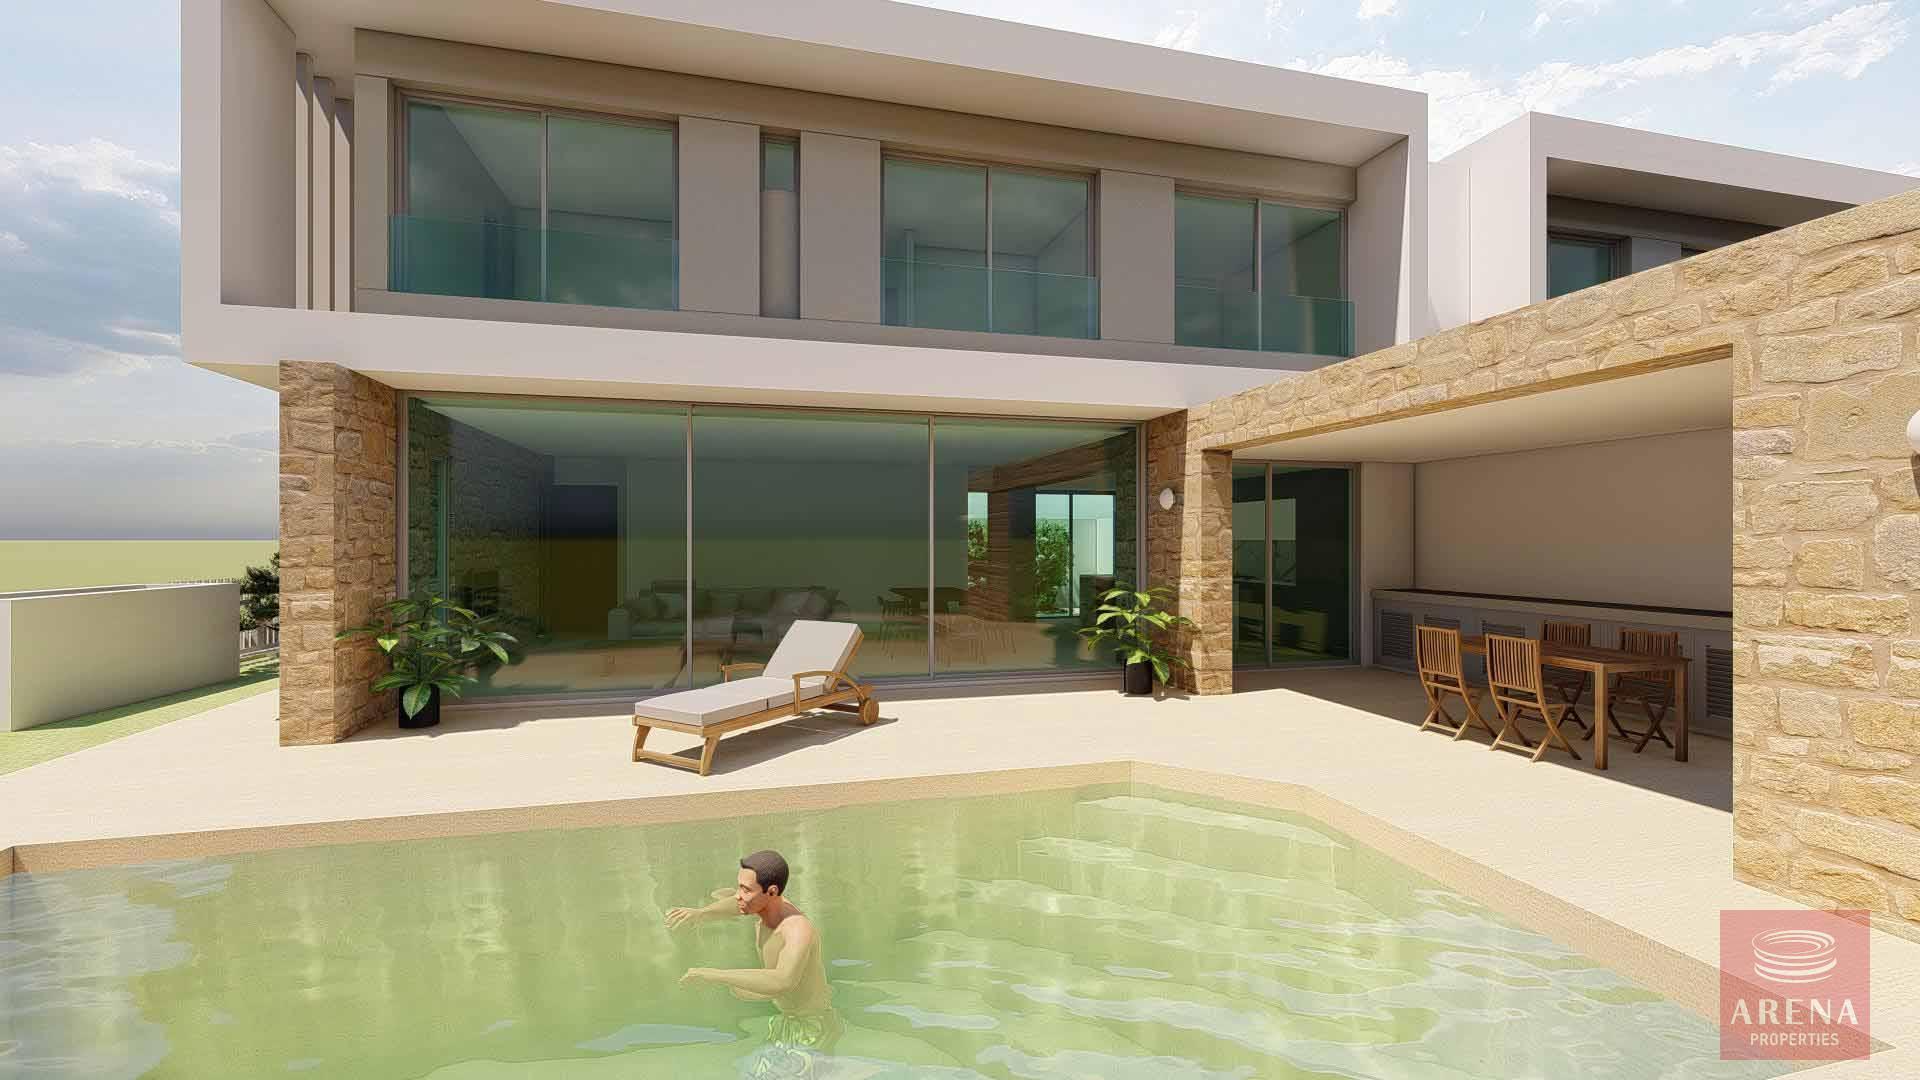 3 bed villa in oroklini